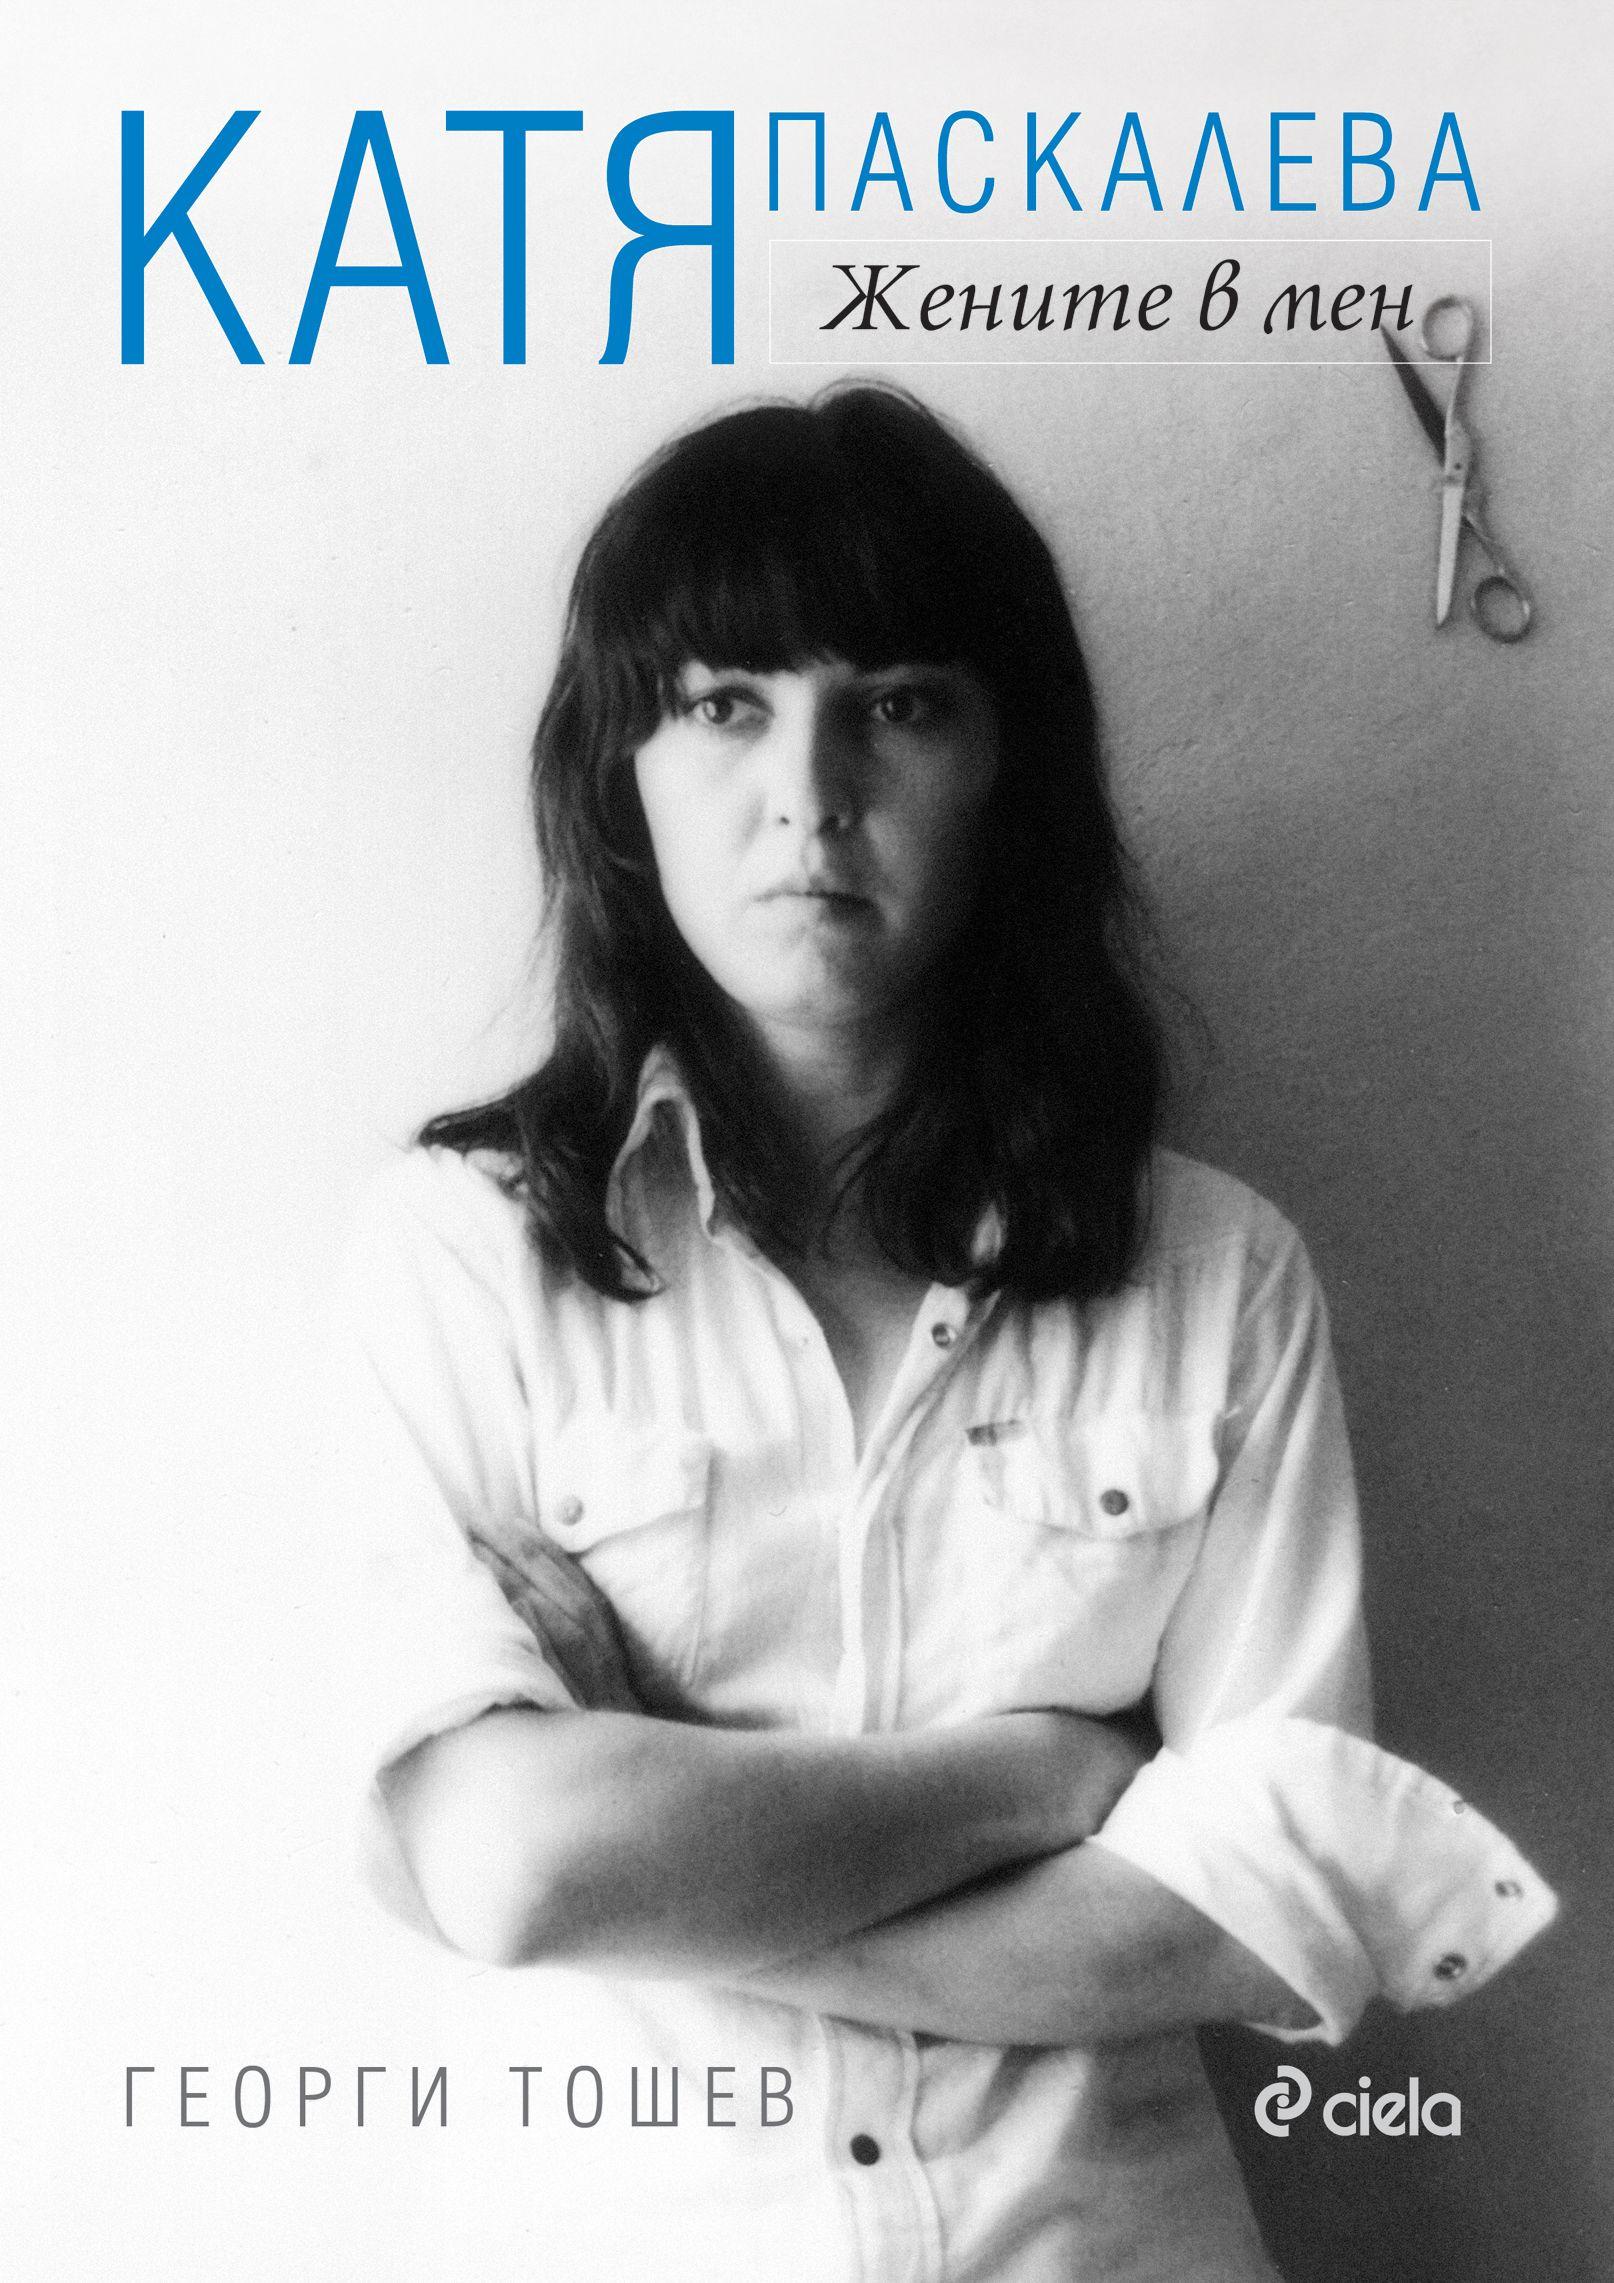 Katia-Paskaleva-cover - 1